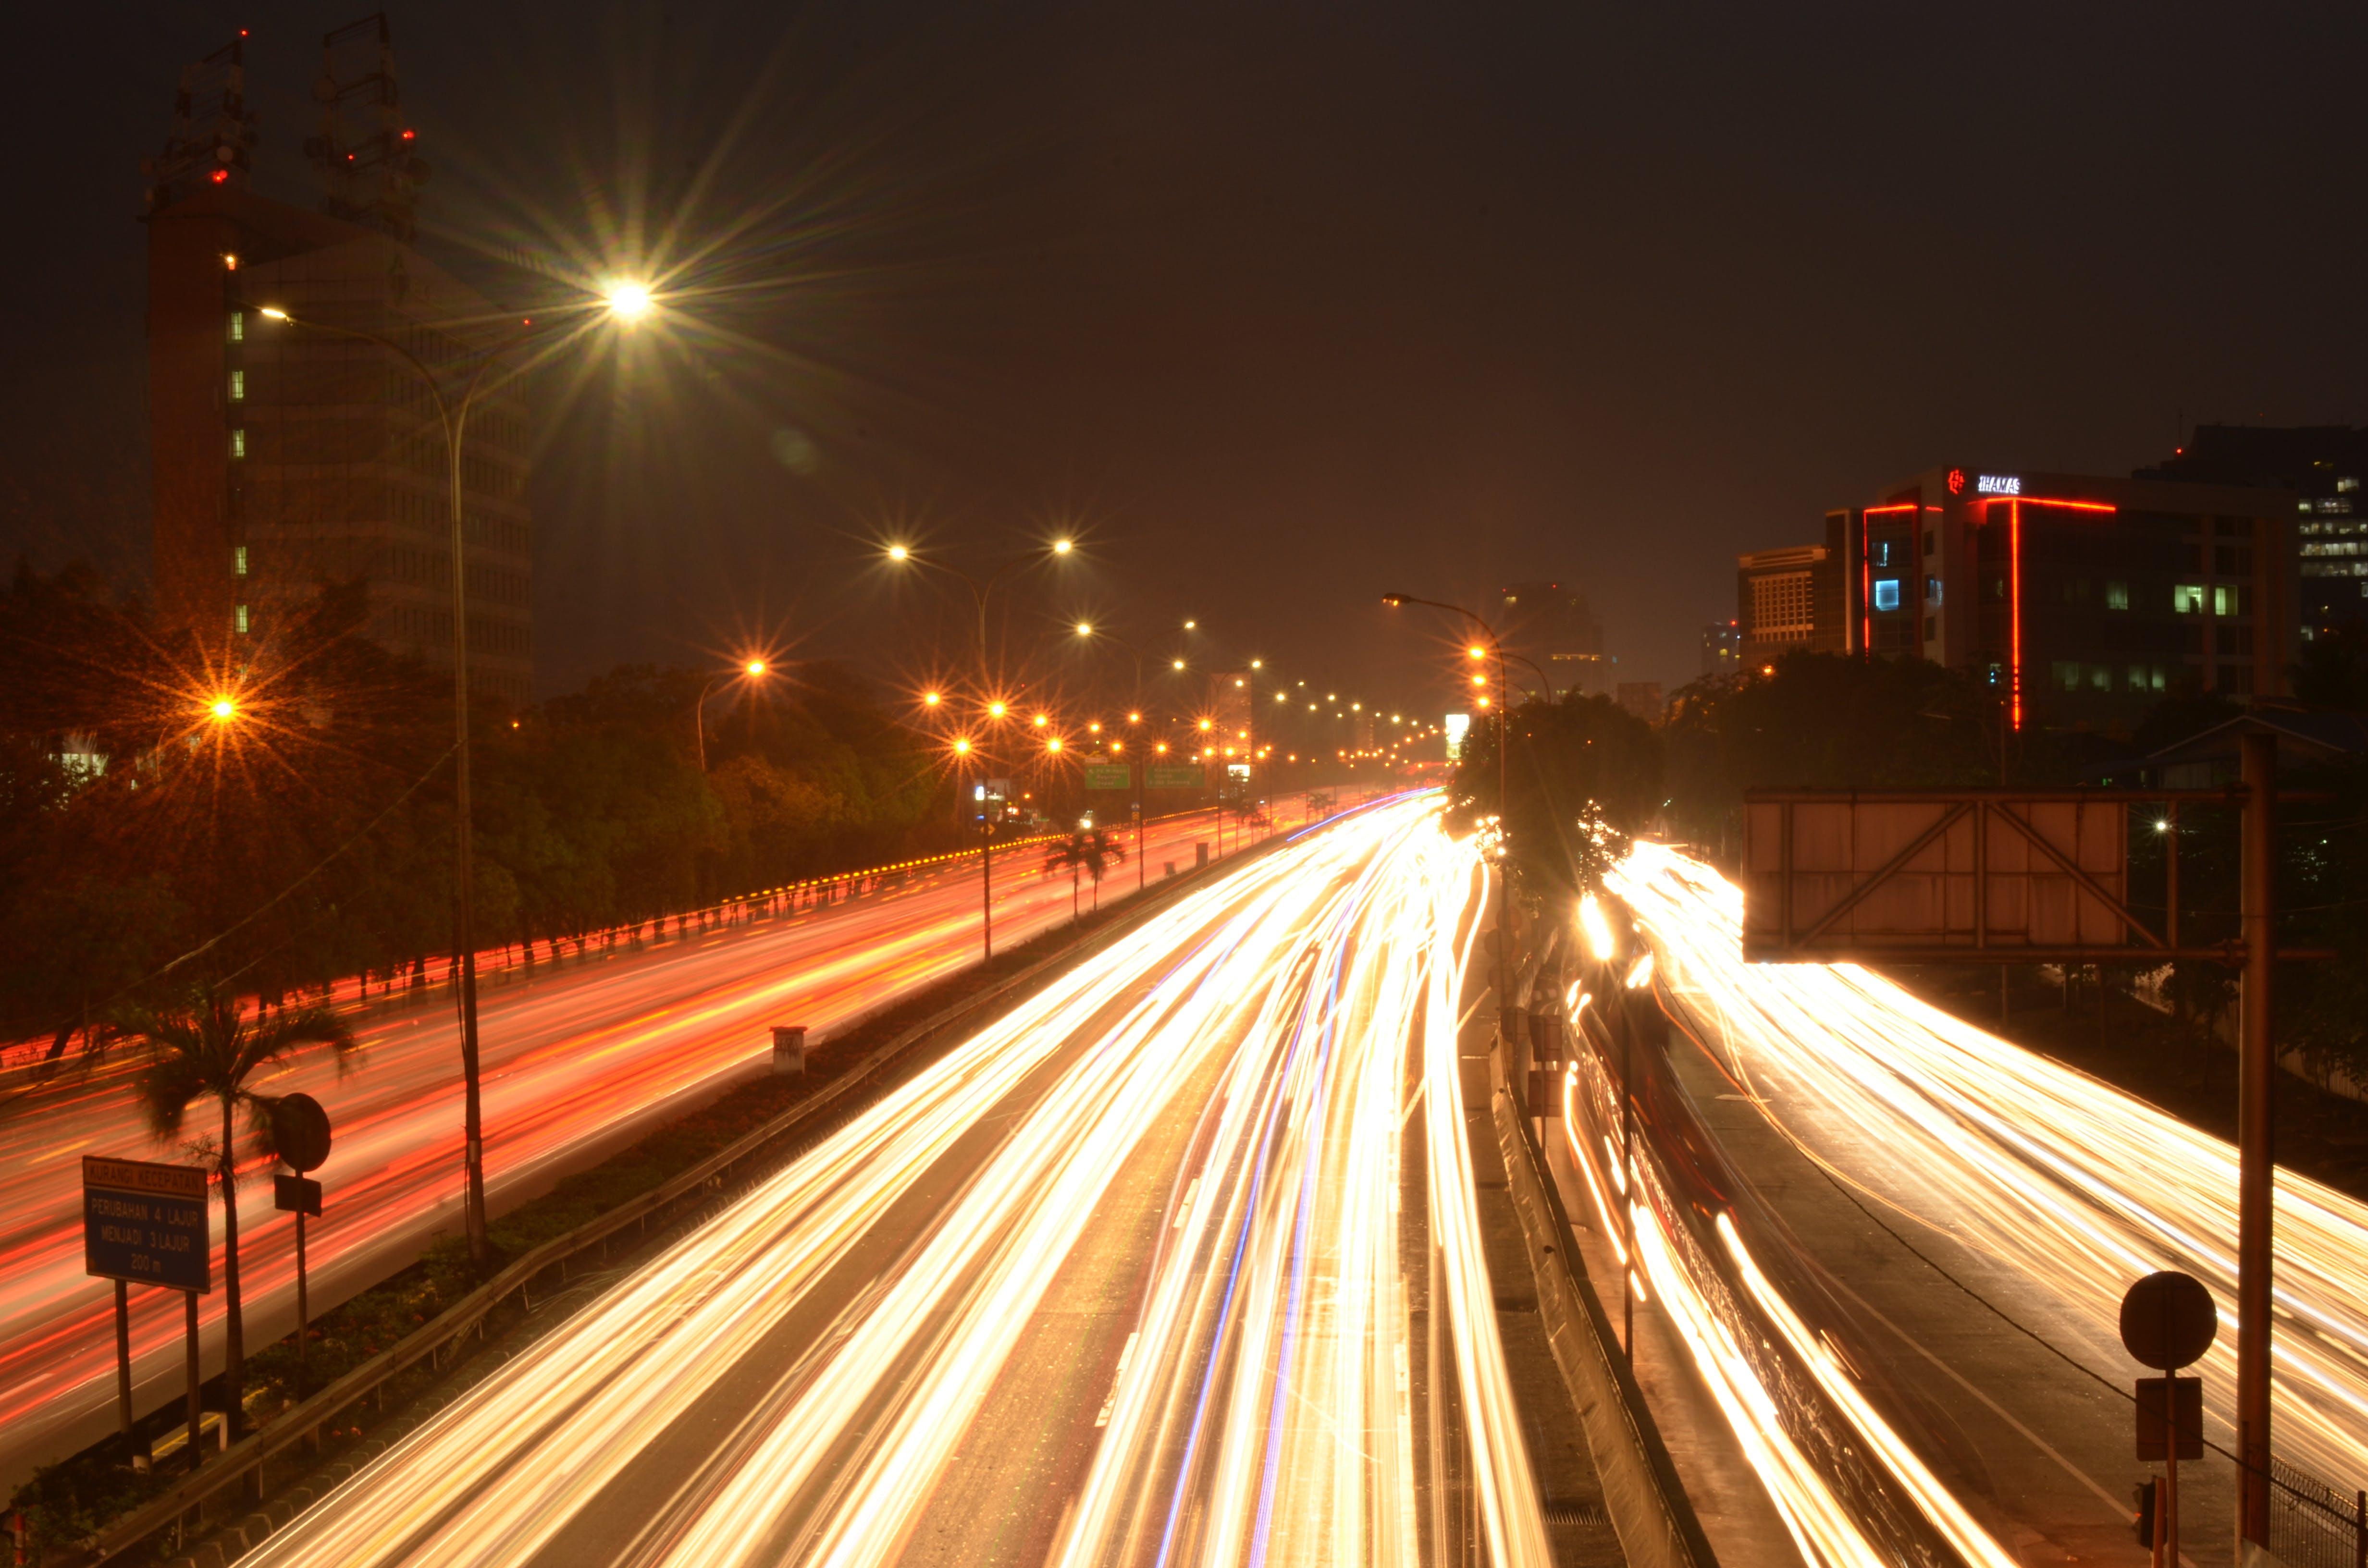 Free stock photo of building, car lights, city lights, lamp